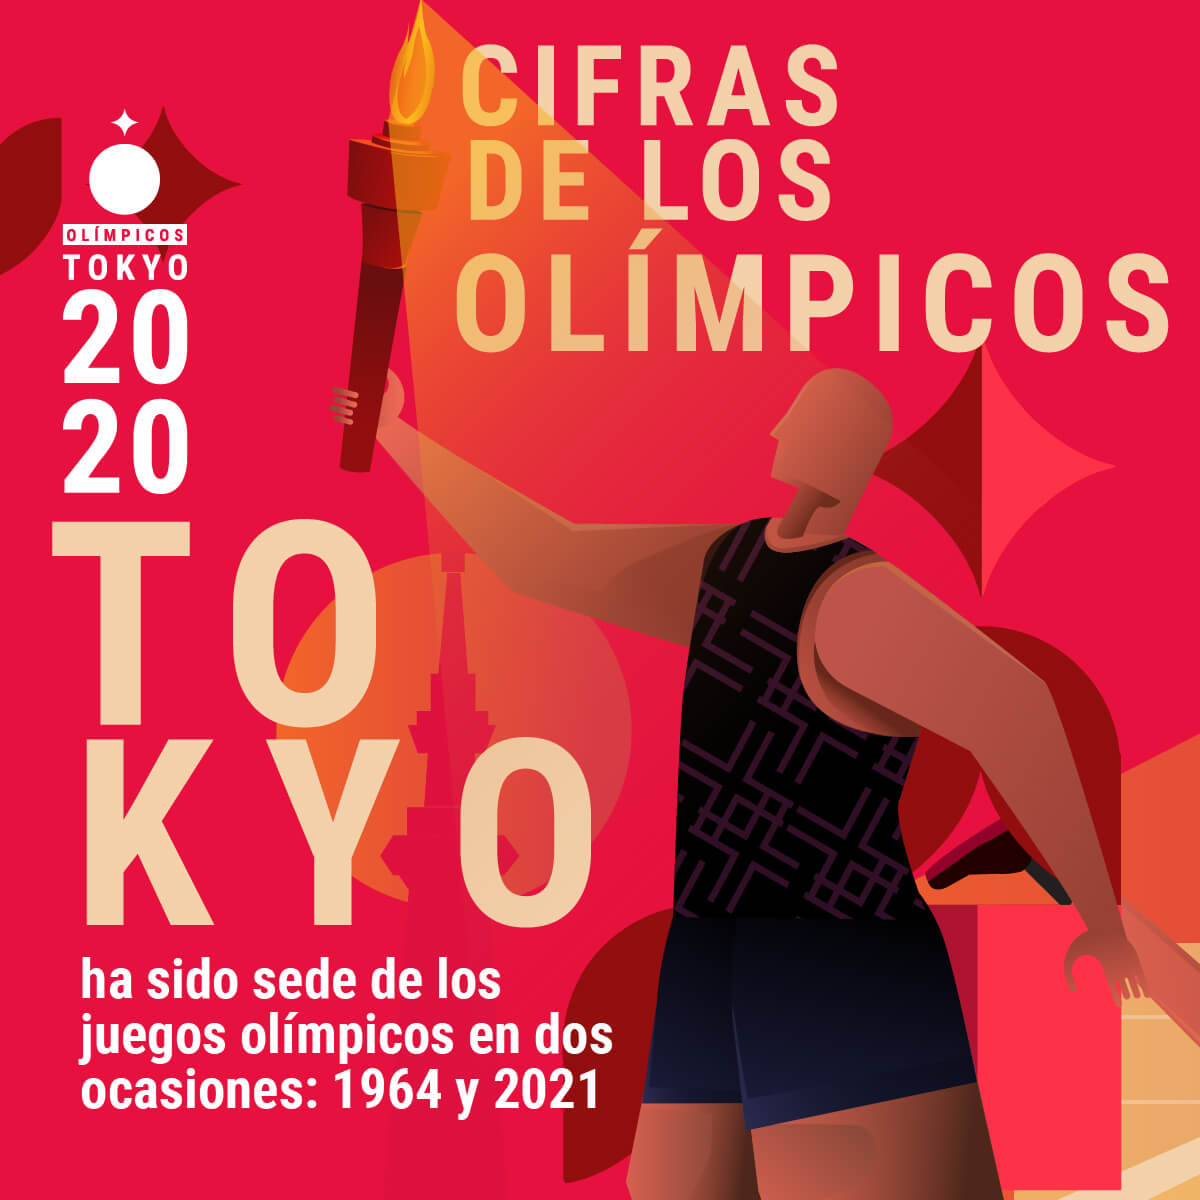 Juegos Olímpicos 2021 Tokio